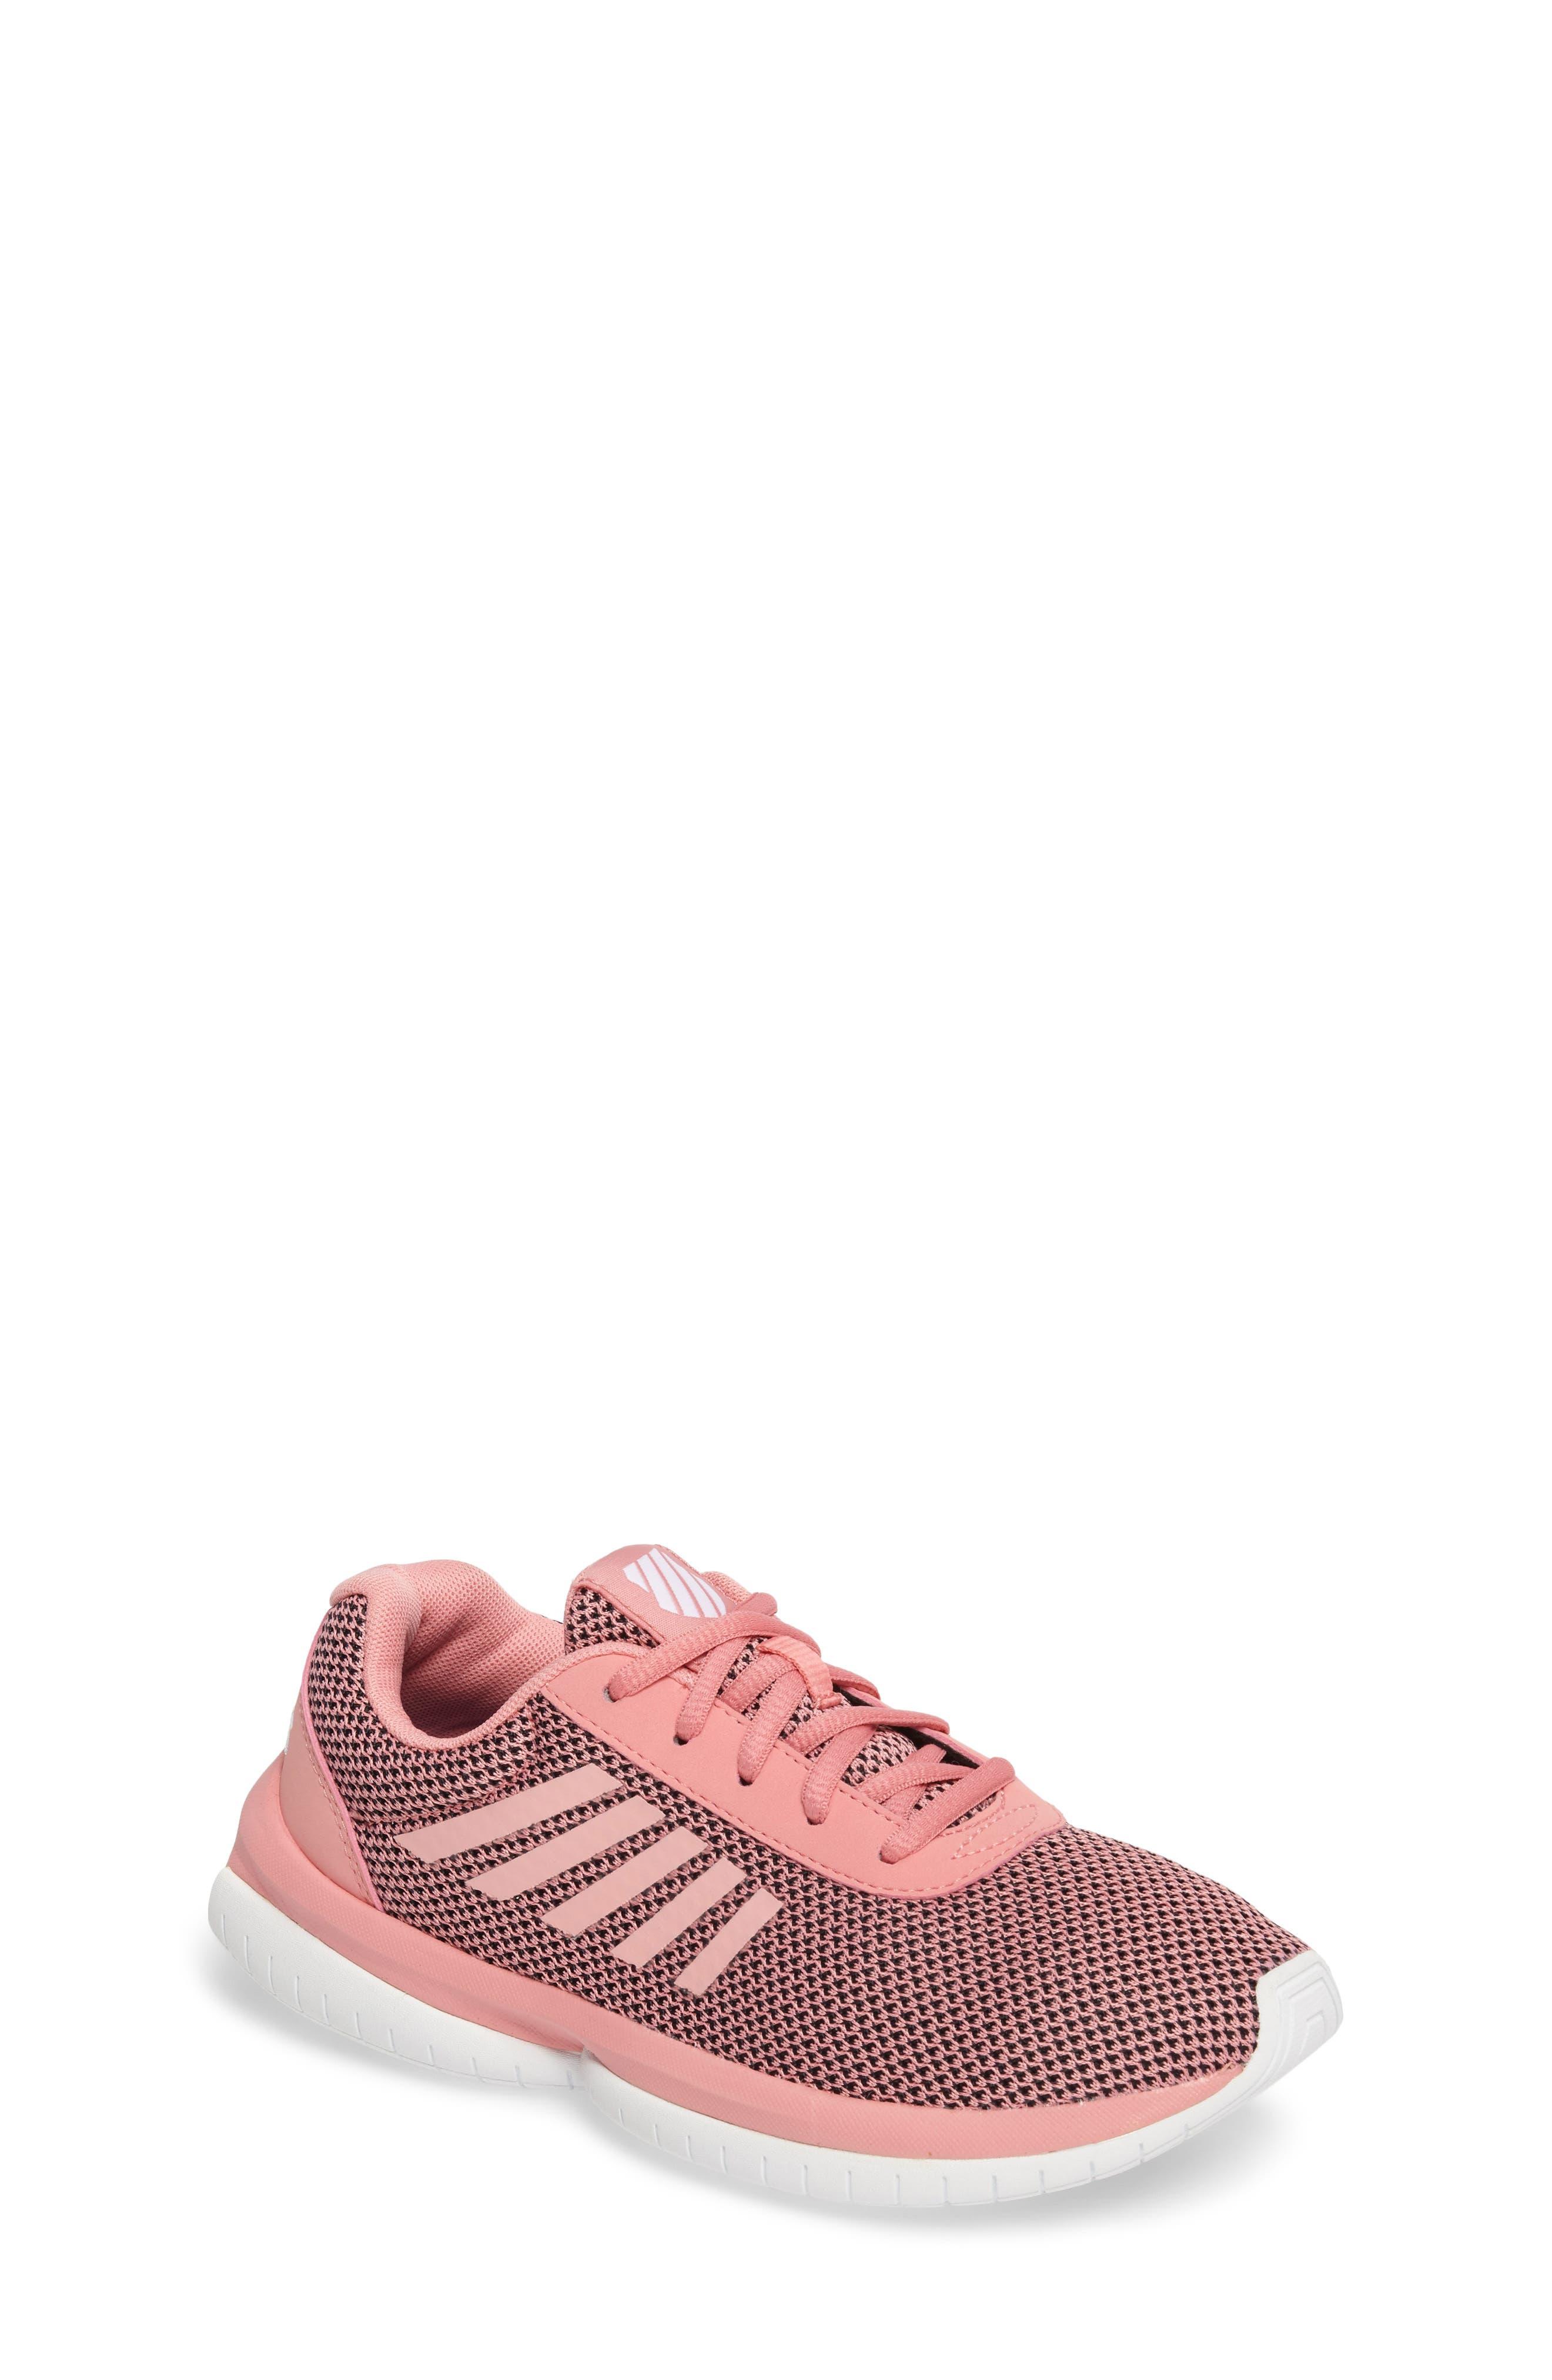 Tubes Infinity Sneaker,                             Main thumbnail 1, color,                             650